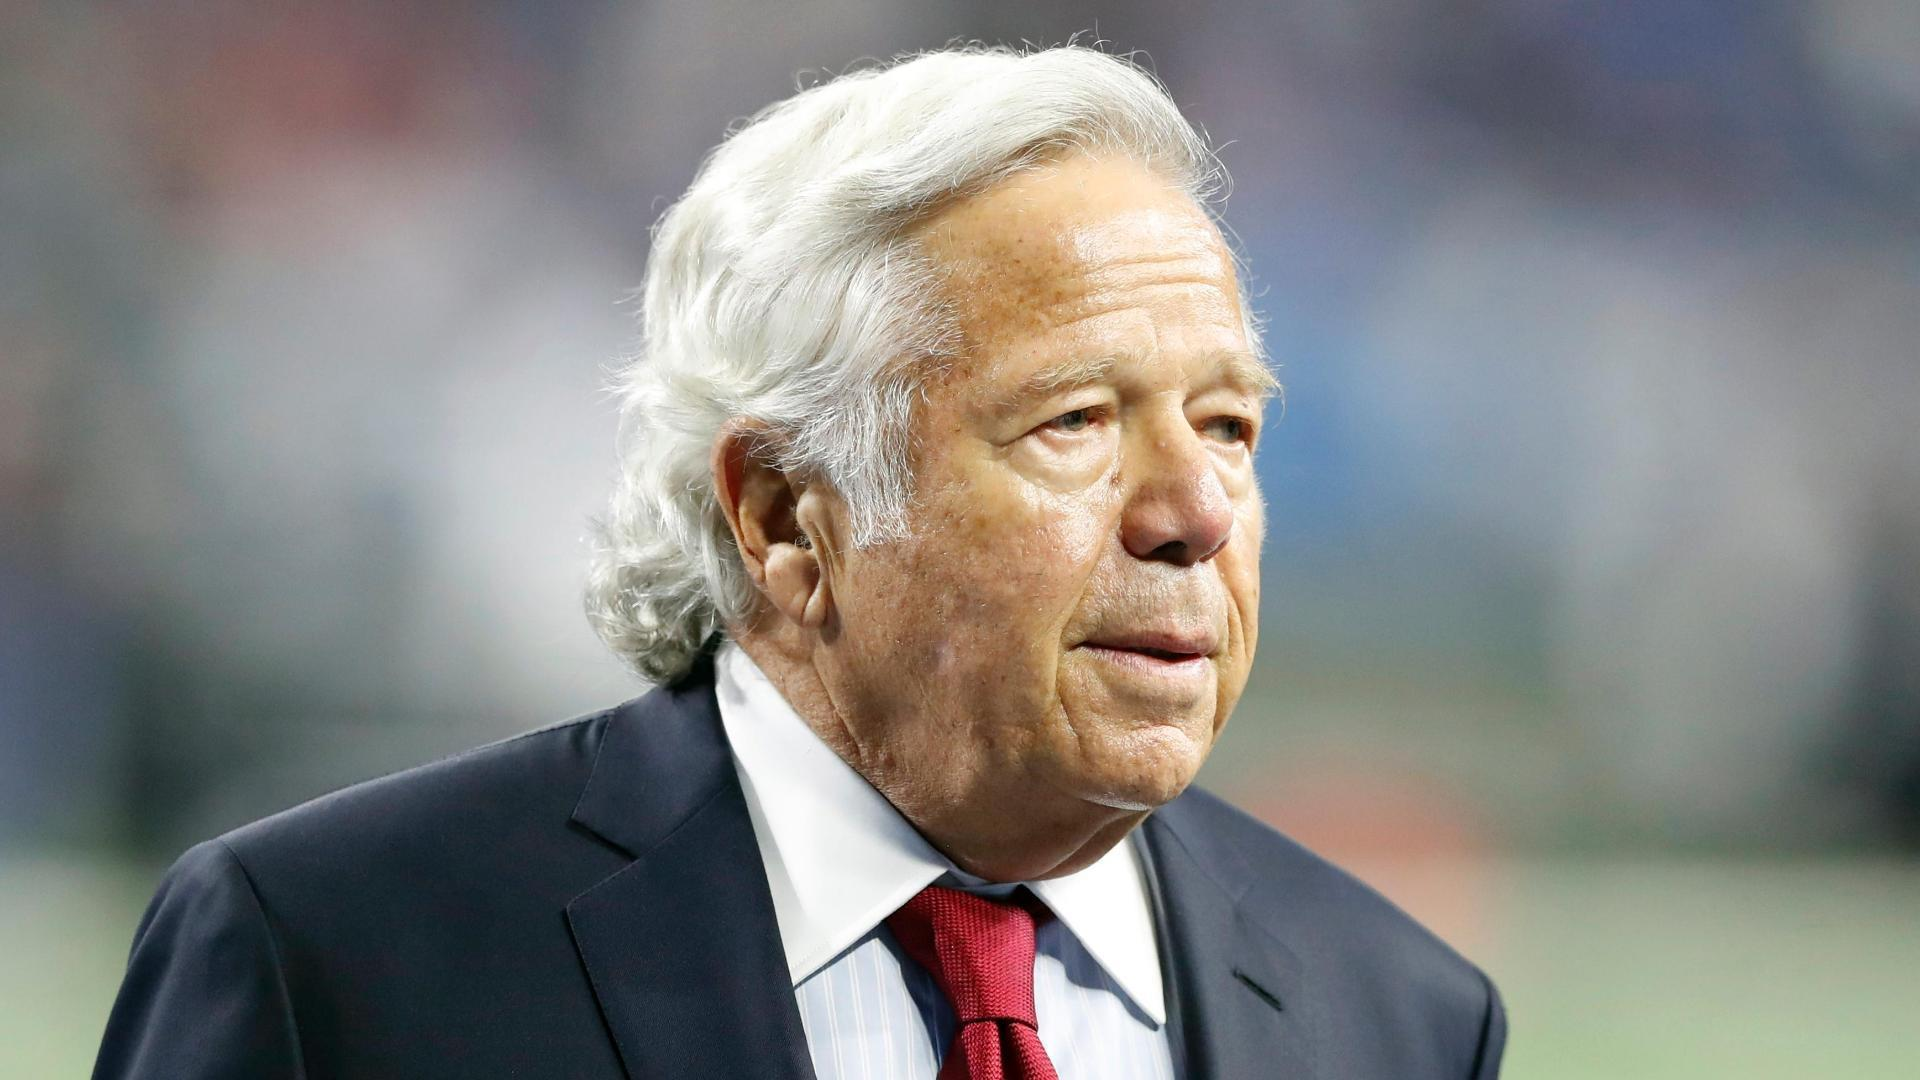 Kraft can avoid prosecution with new plea deal